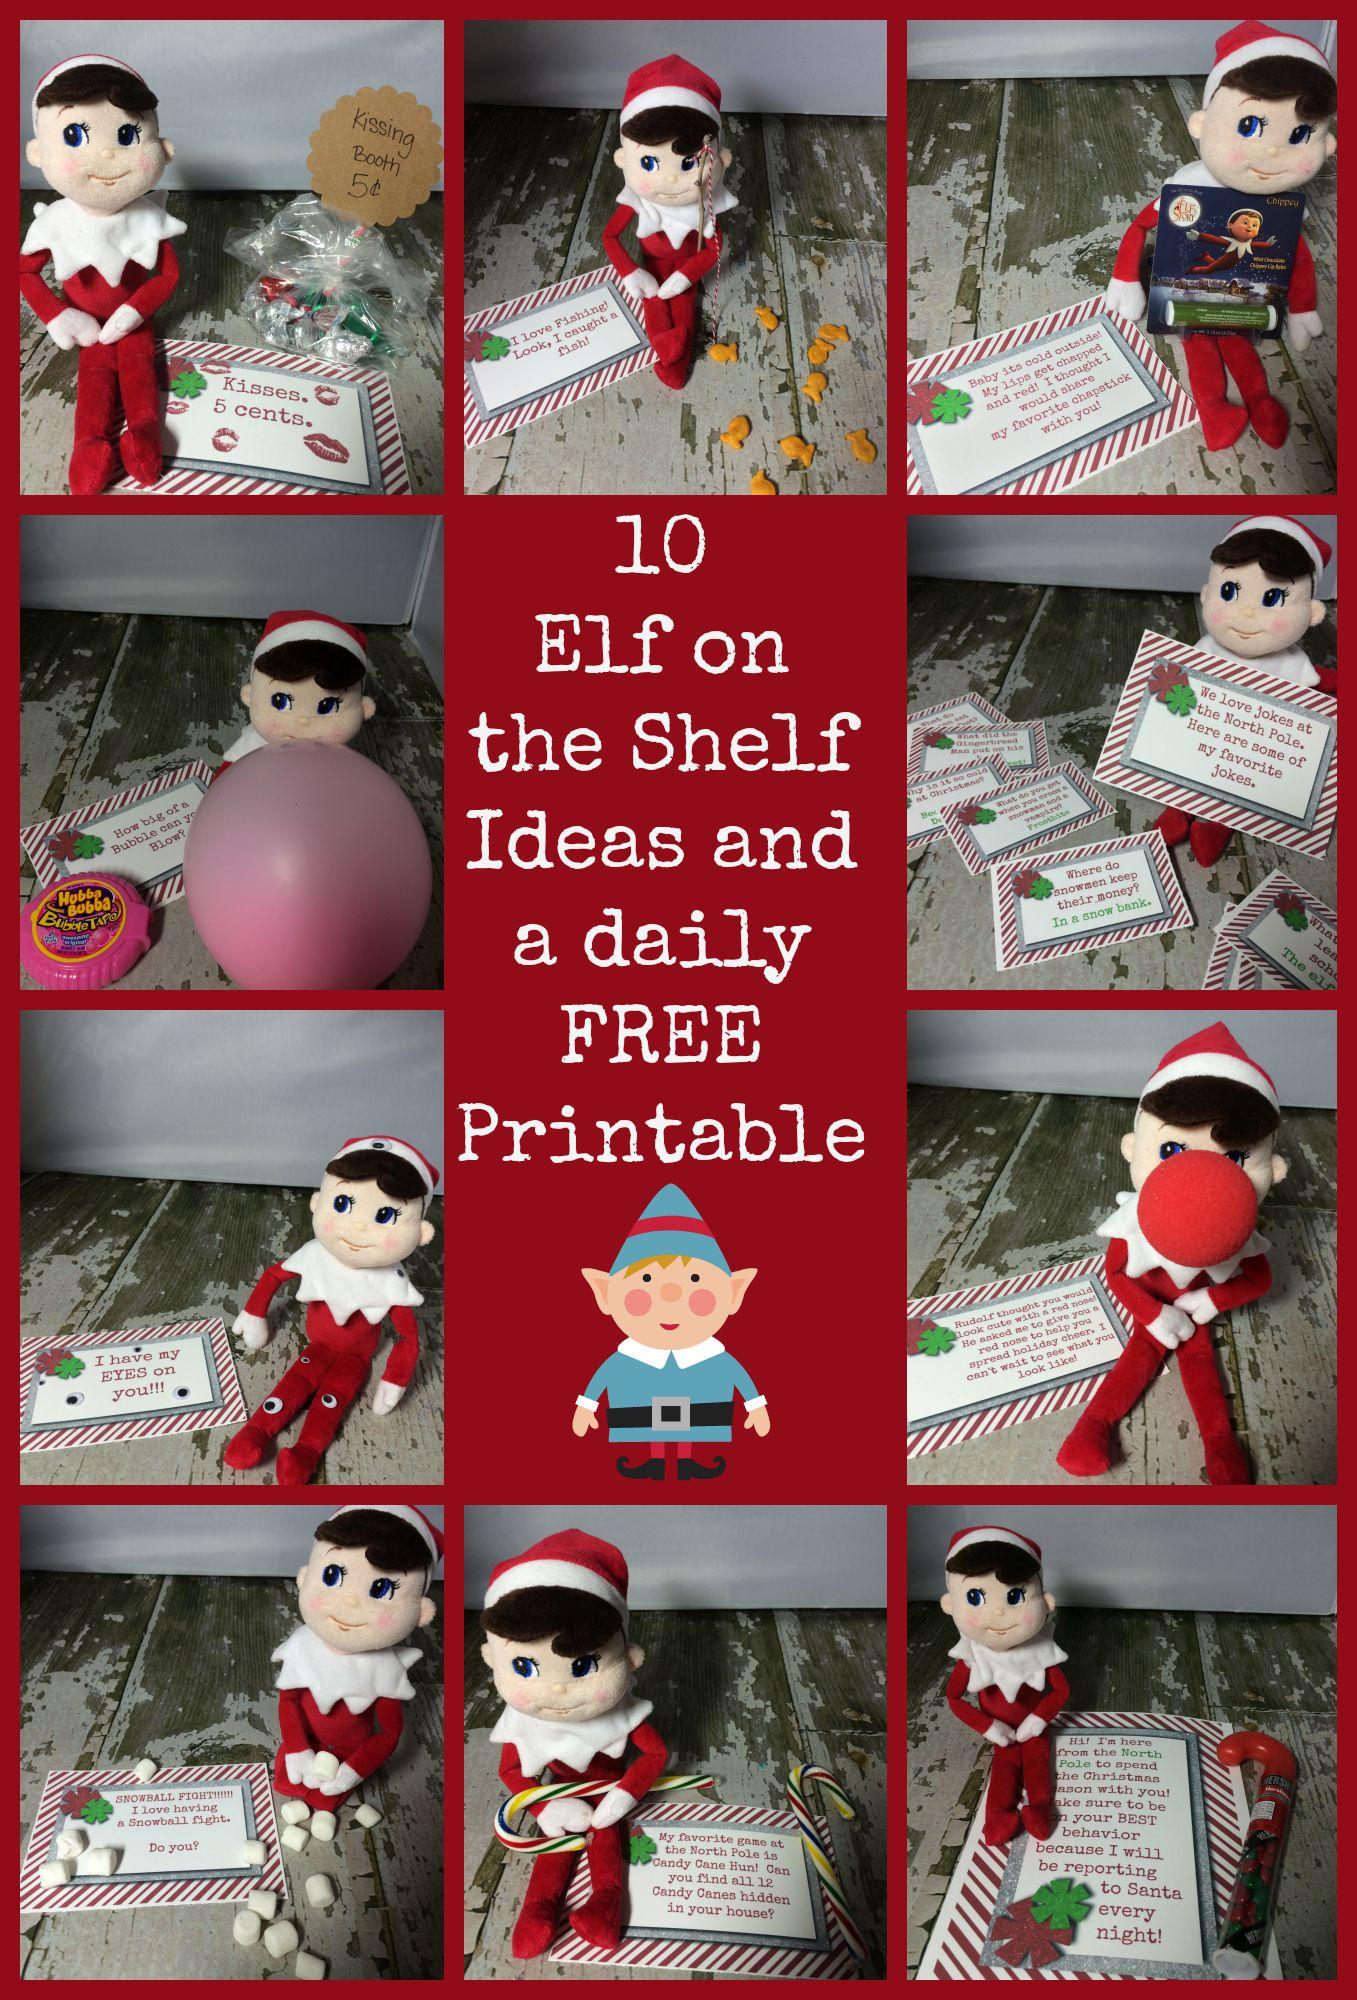 10 Easy Elf On A Shelf Ideas and a daily FREE Elf on the Shelf Christmas